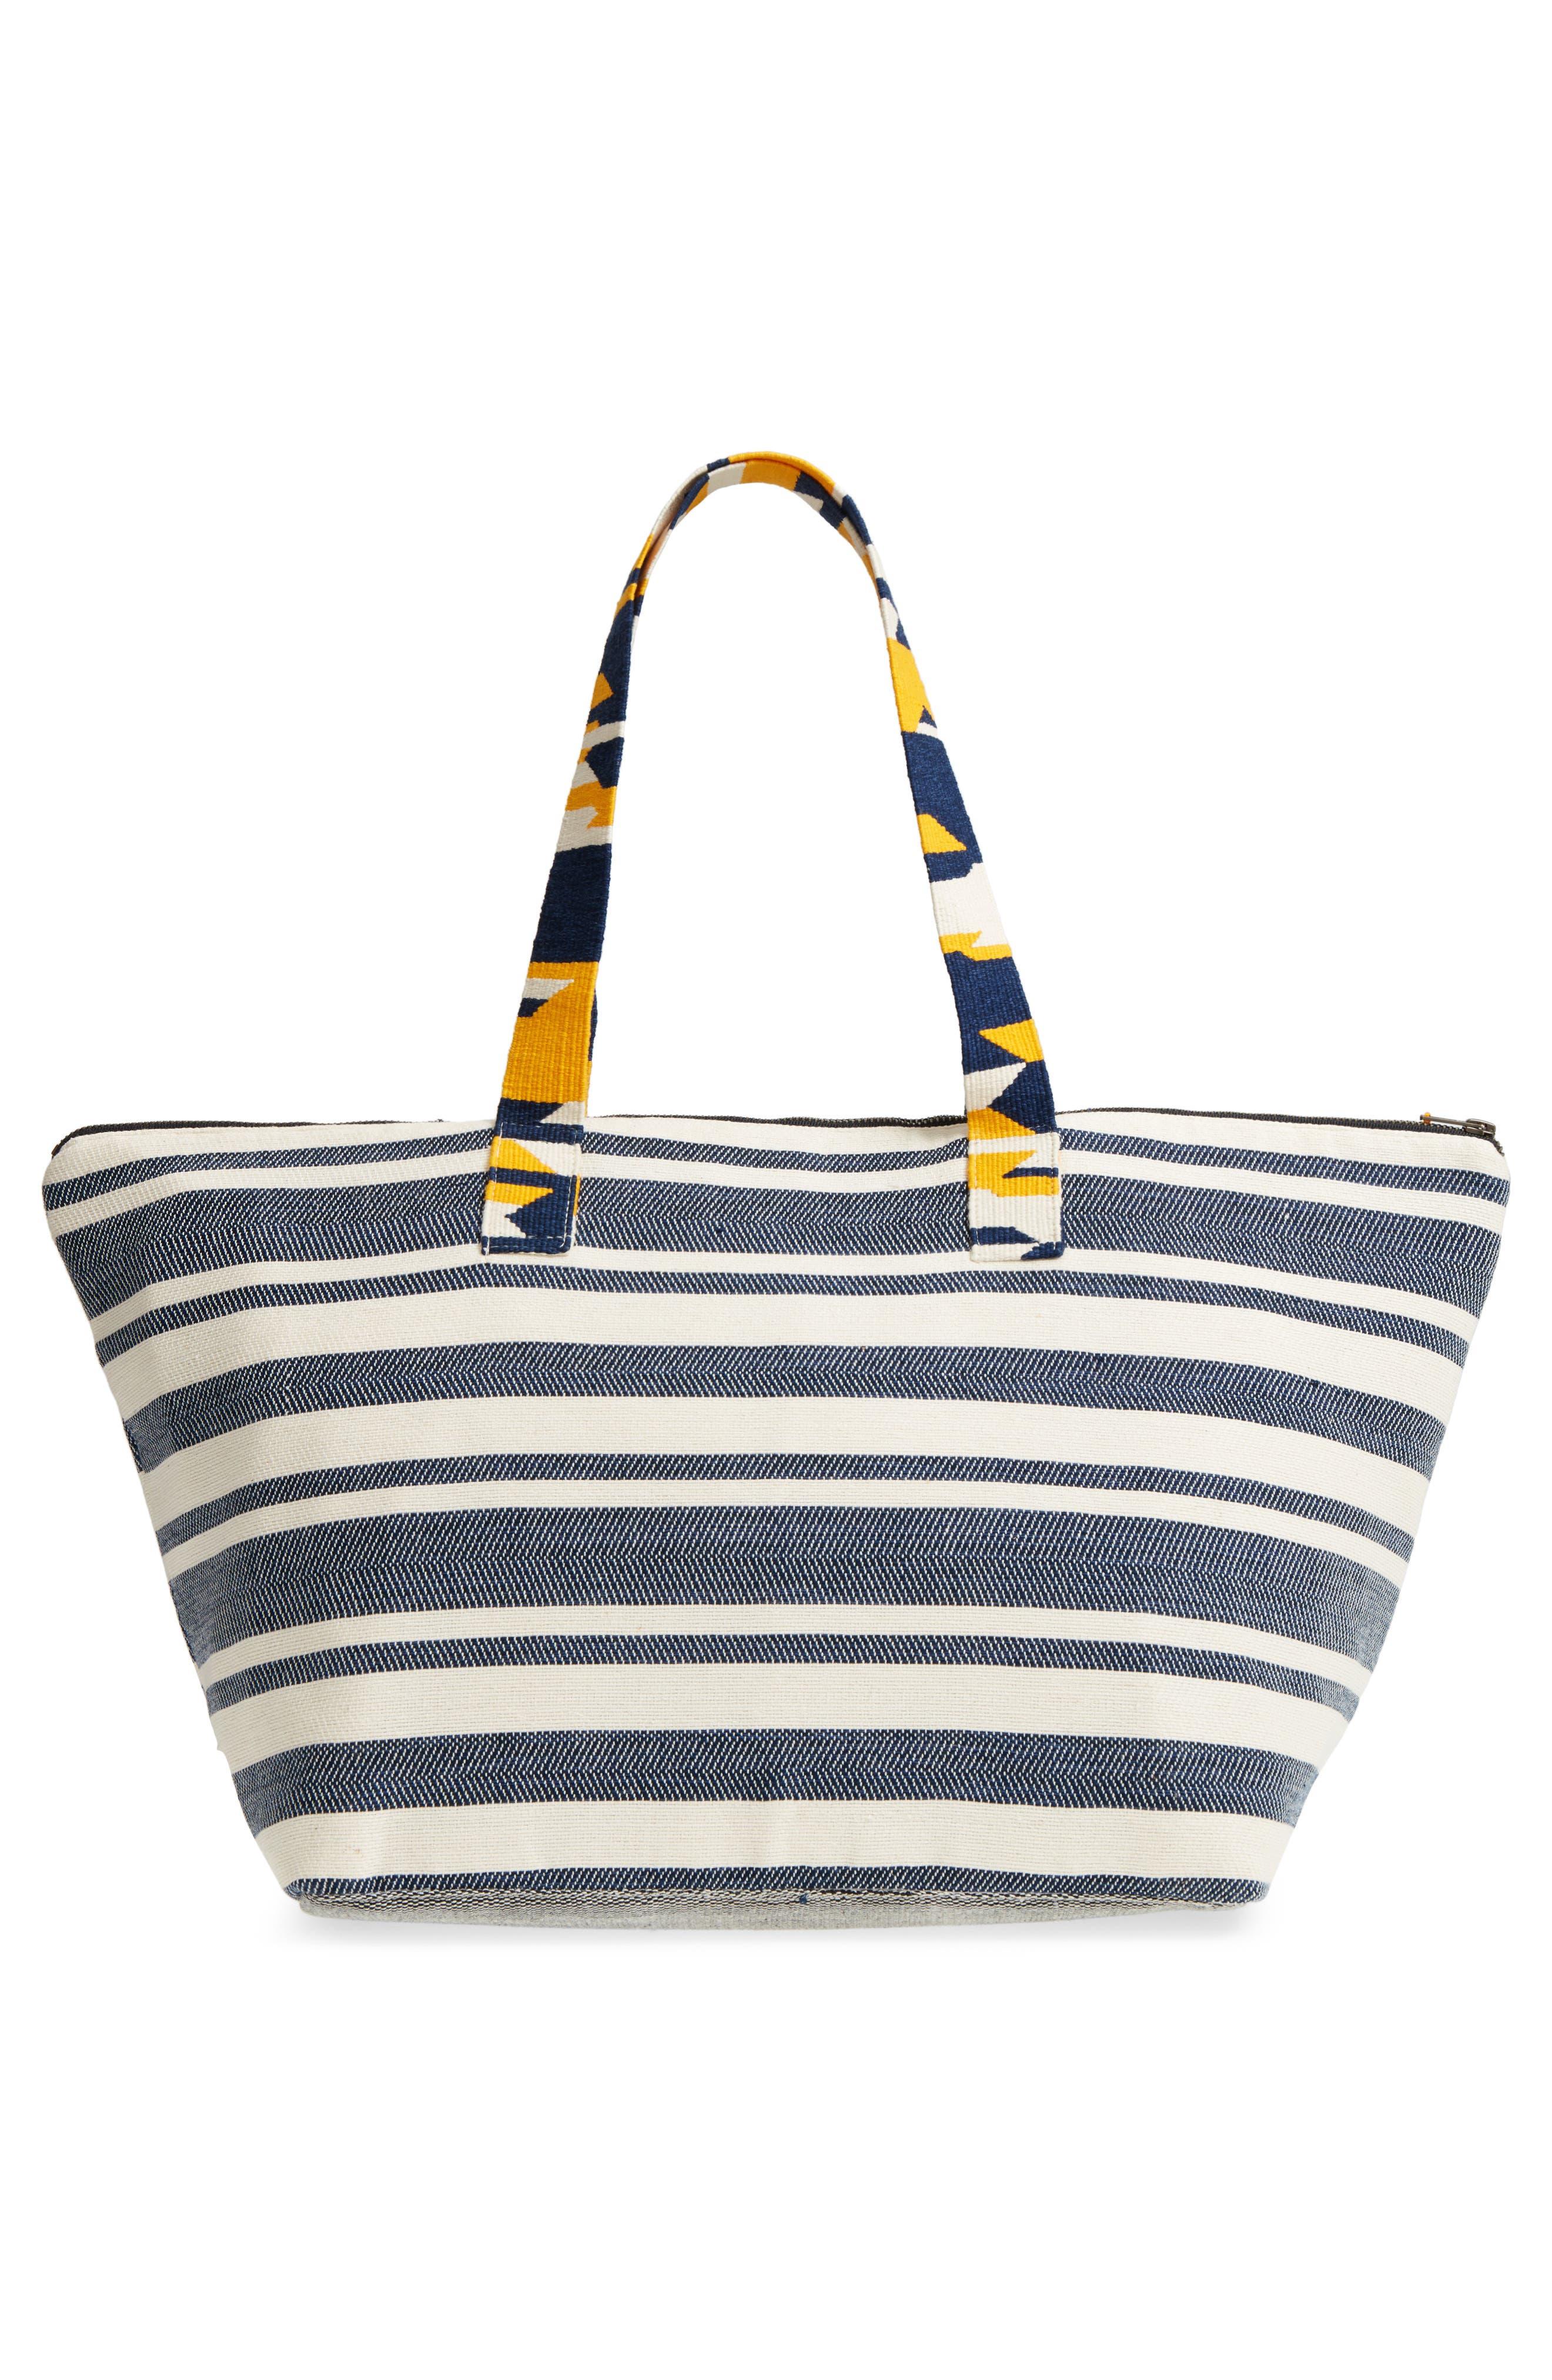 Iris Beach Bag,                             Alternate thumbnail 3, color,                             Sungold Denim Twill